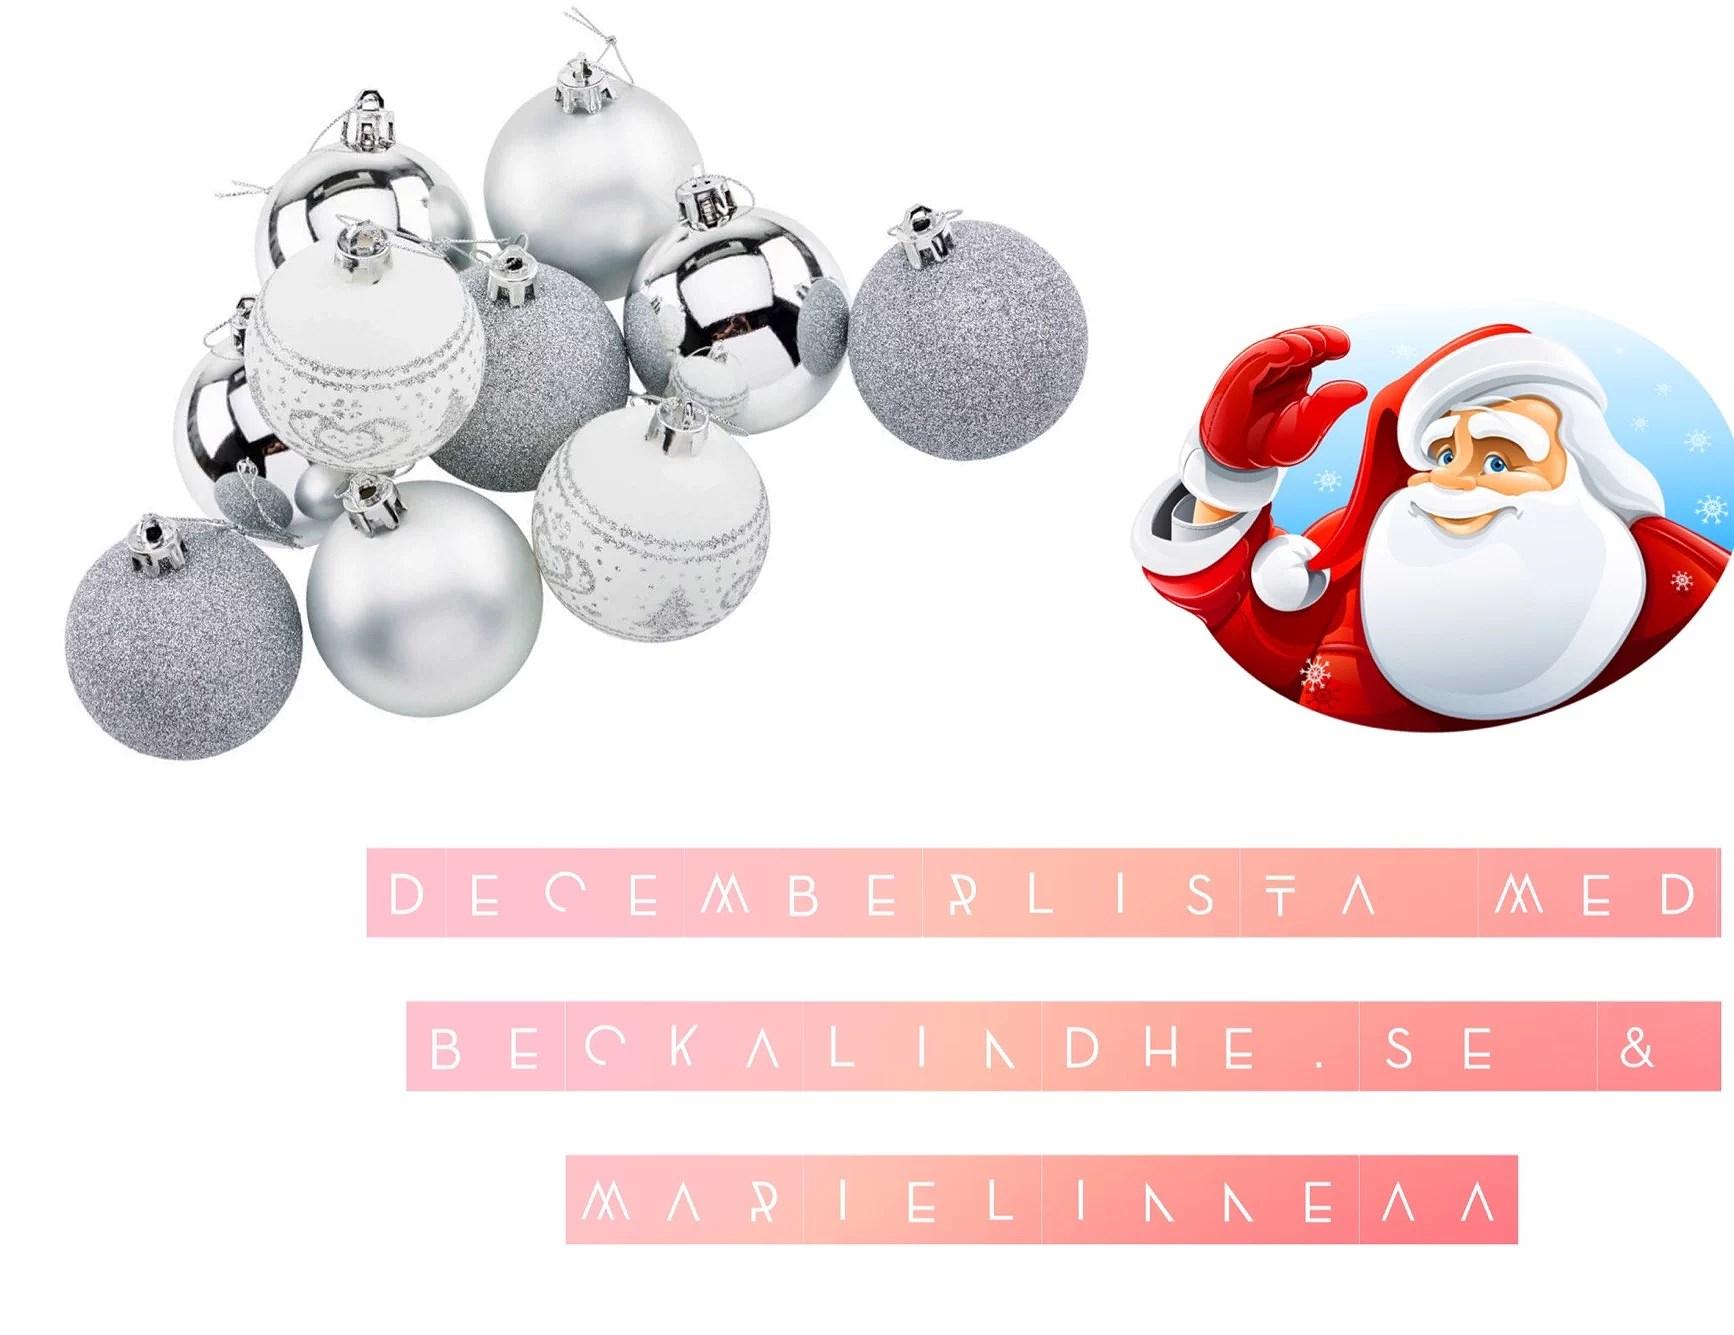 Decemberlista dag 18